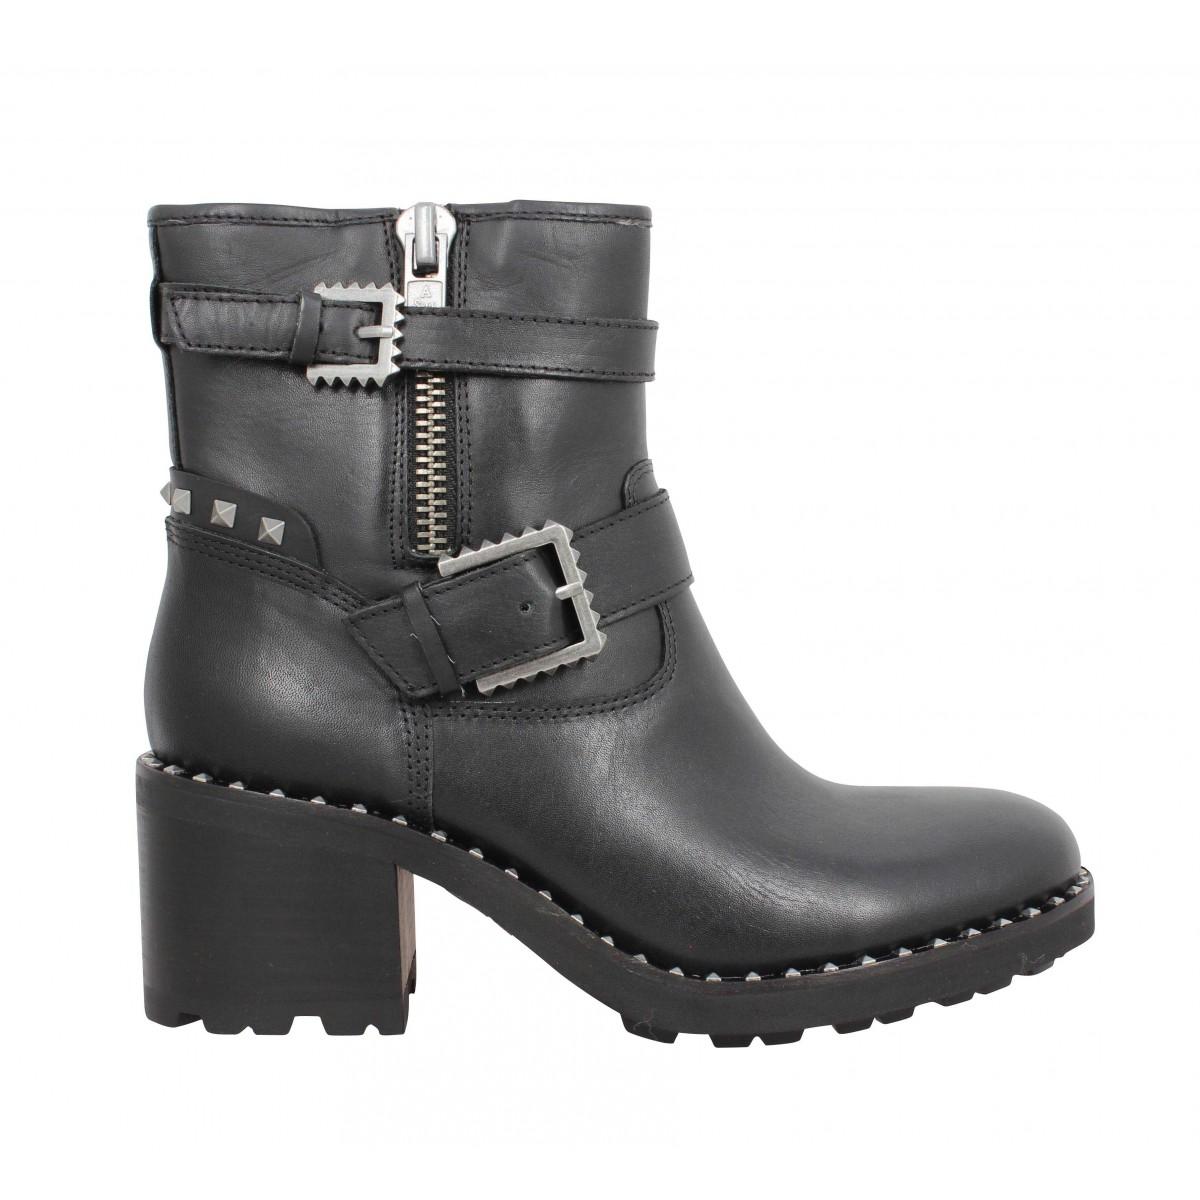 Xenon Femme Ash Cuir Fanny Chaussures Noir 1OxqRd